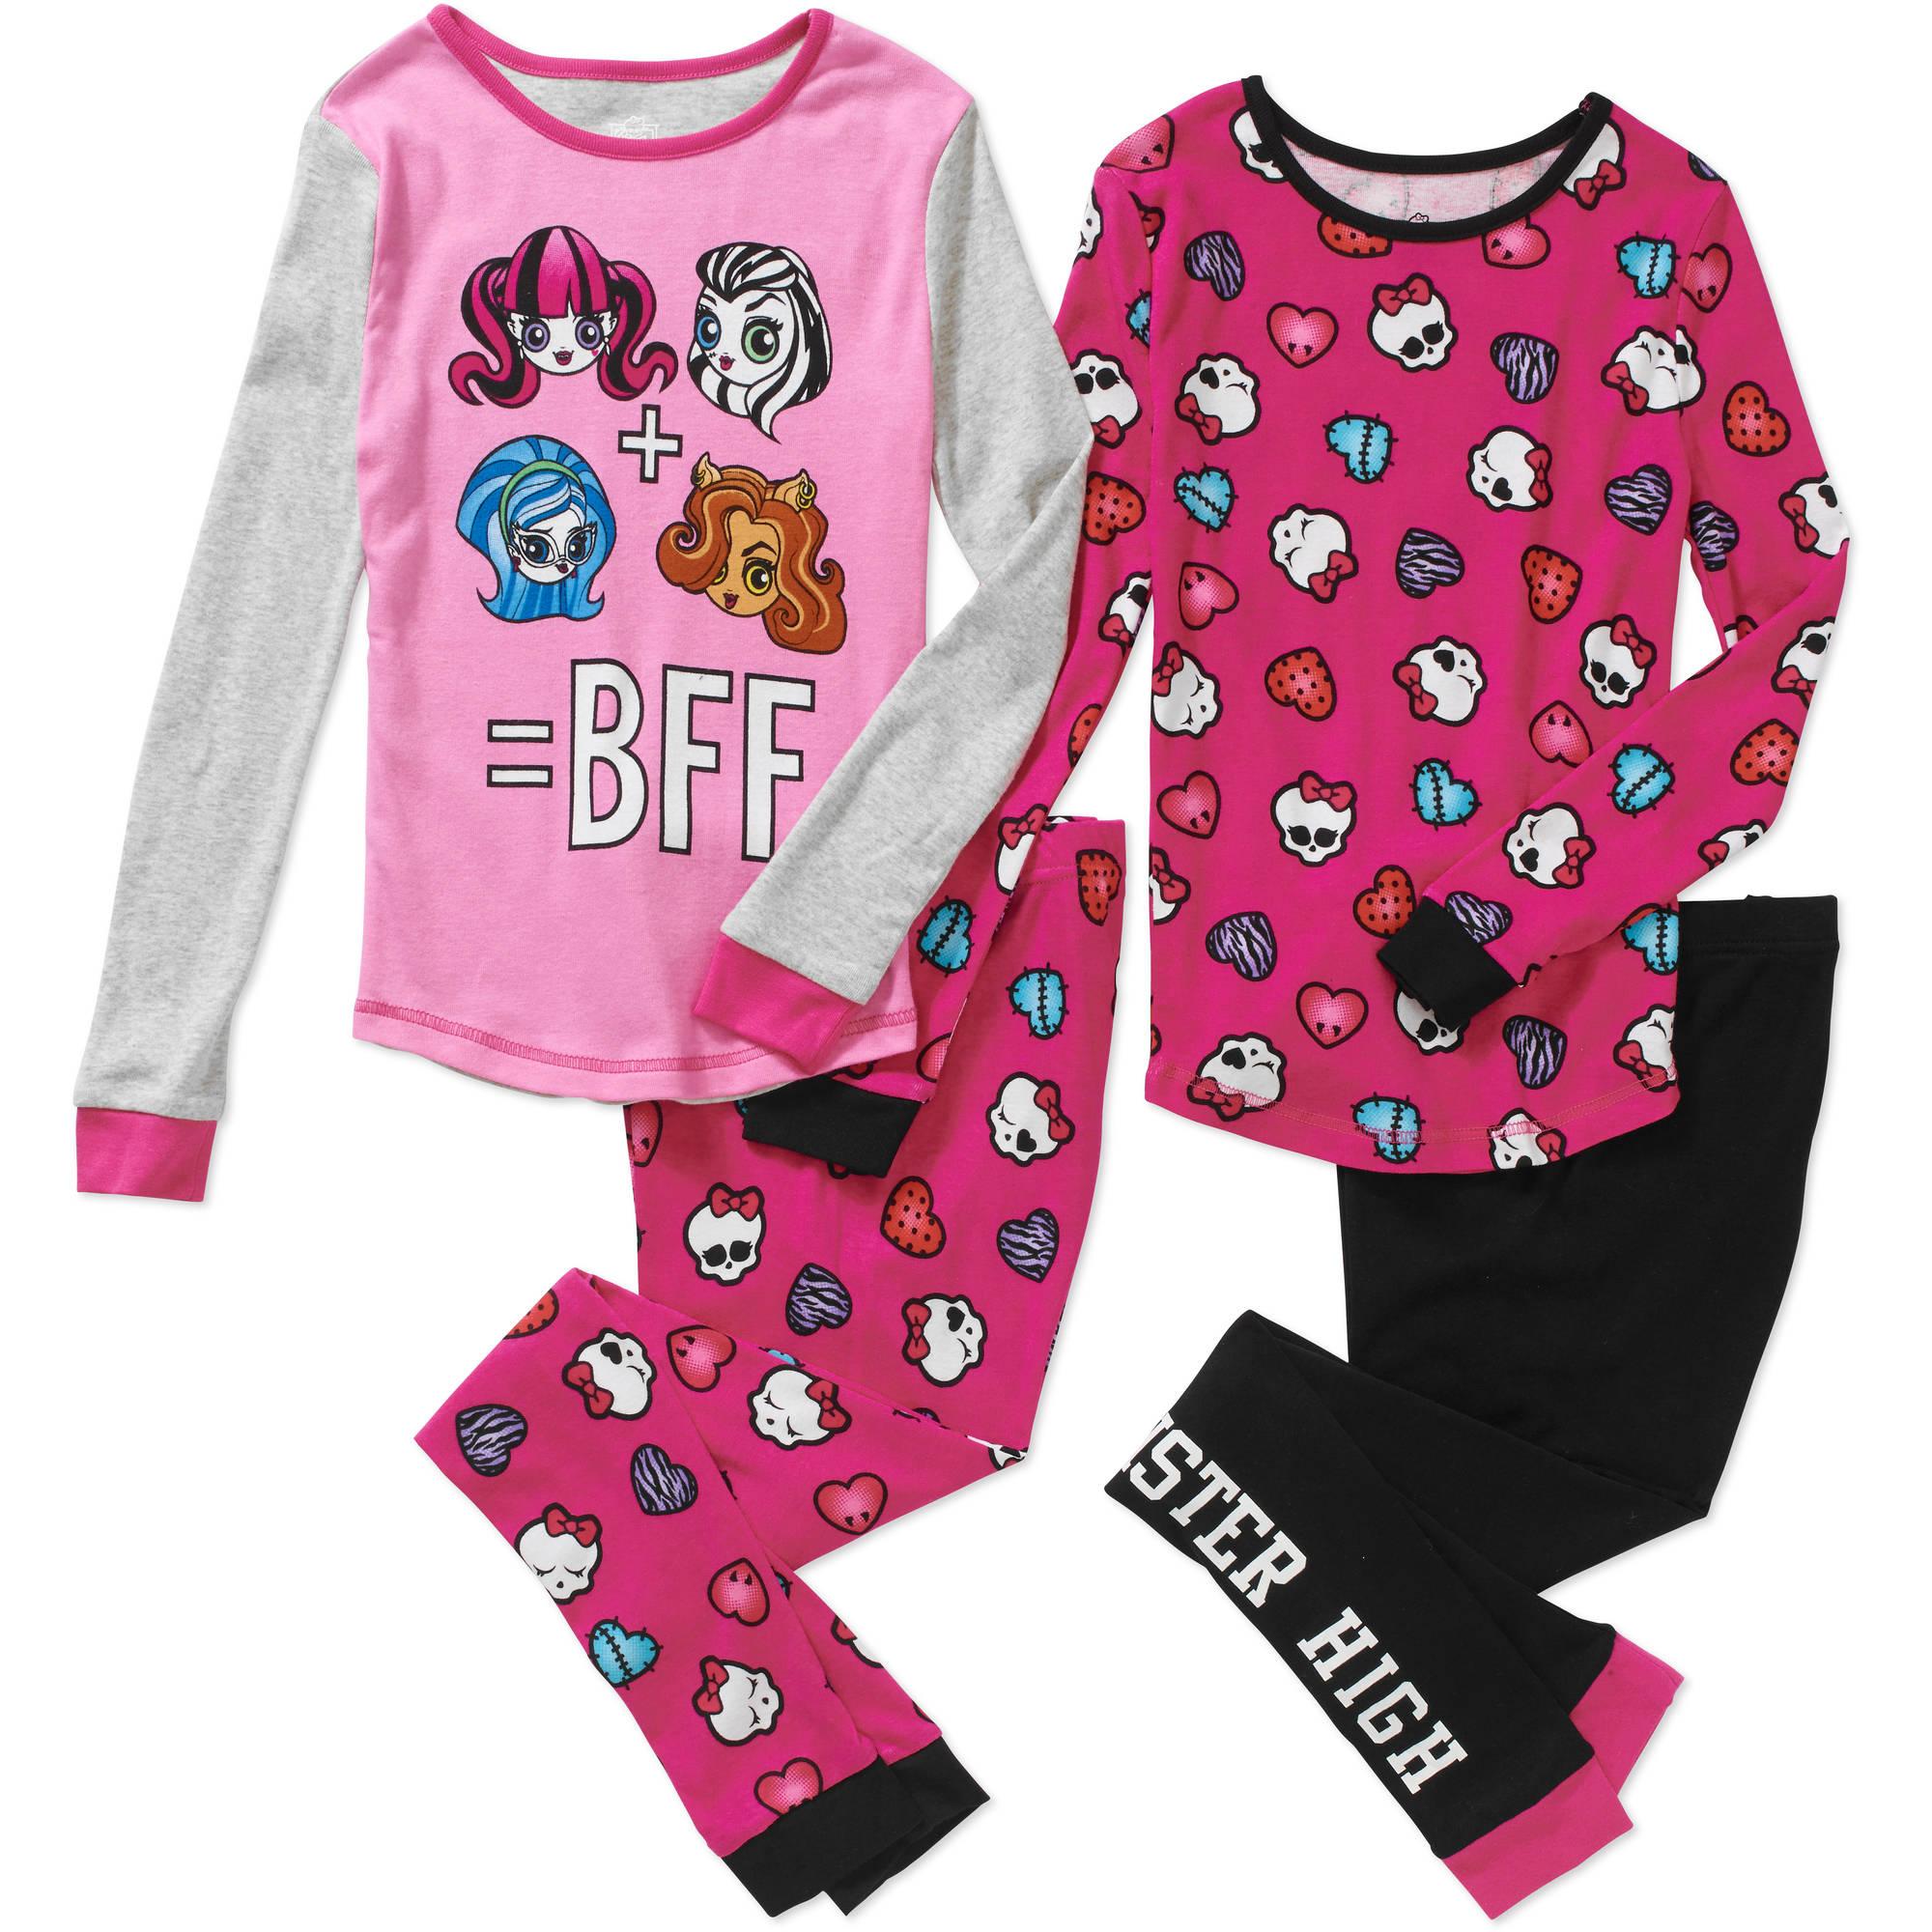 Girls' Monster High 4pc cotton sleepwear set